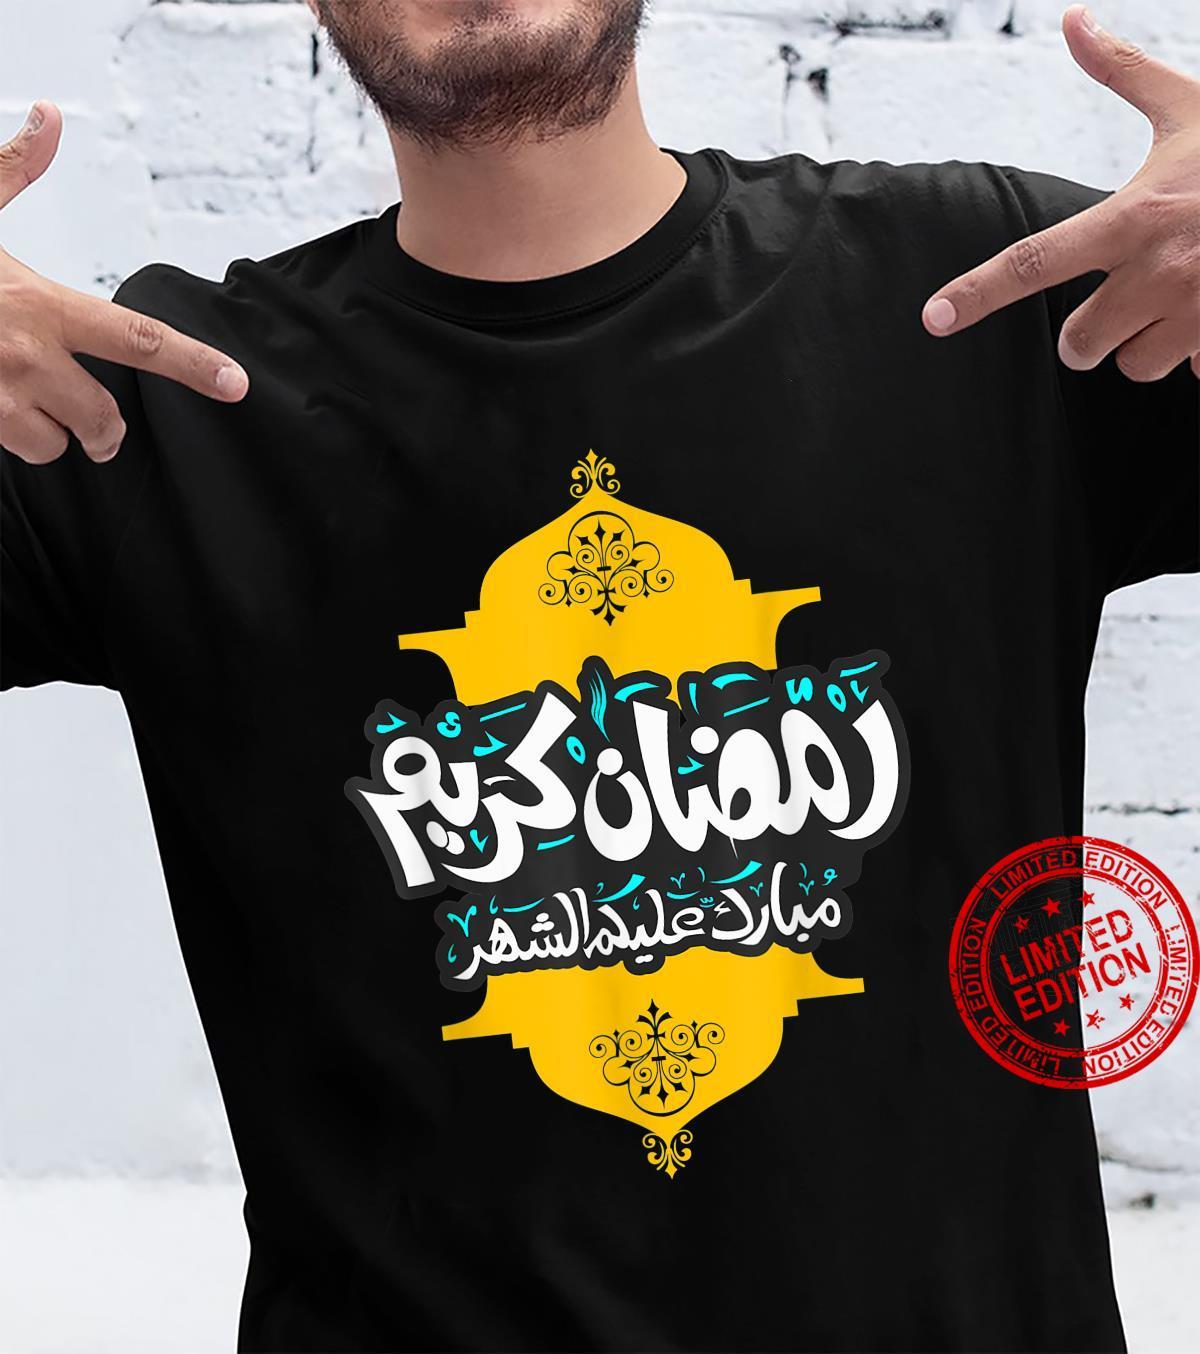 Ramadan Kareem, Cool Islamic fasting outfit & Shirt